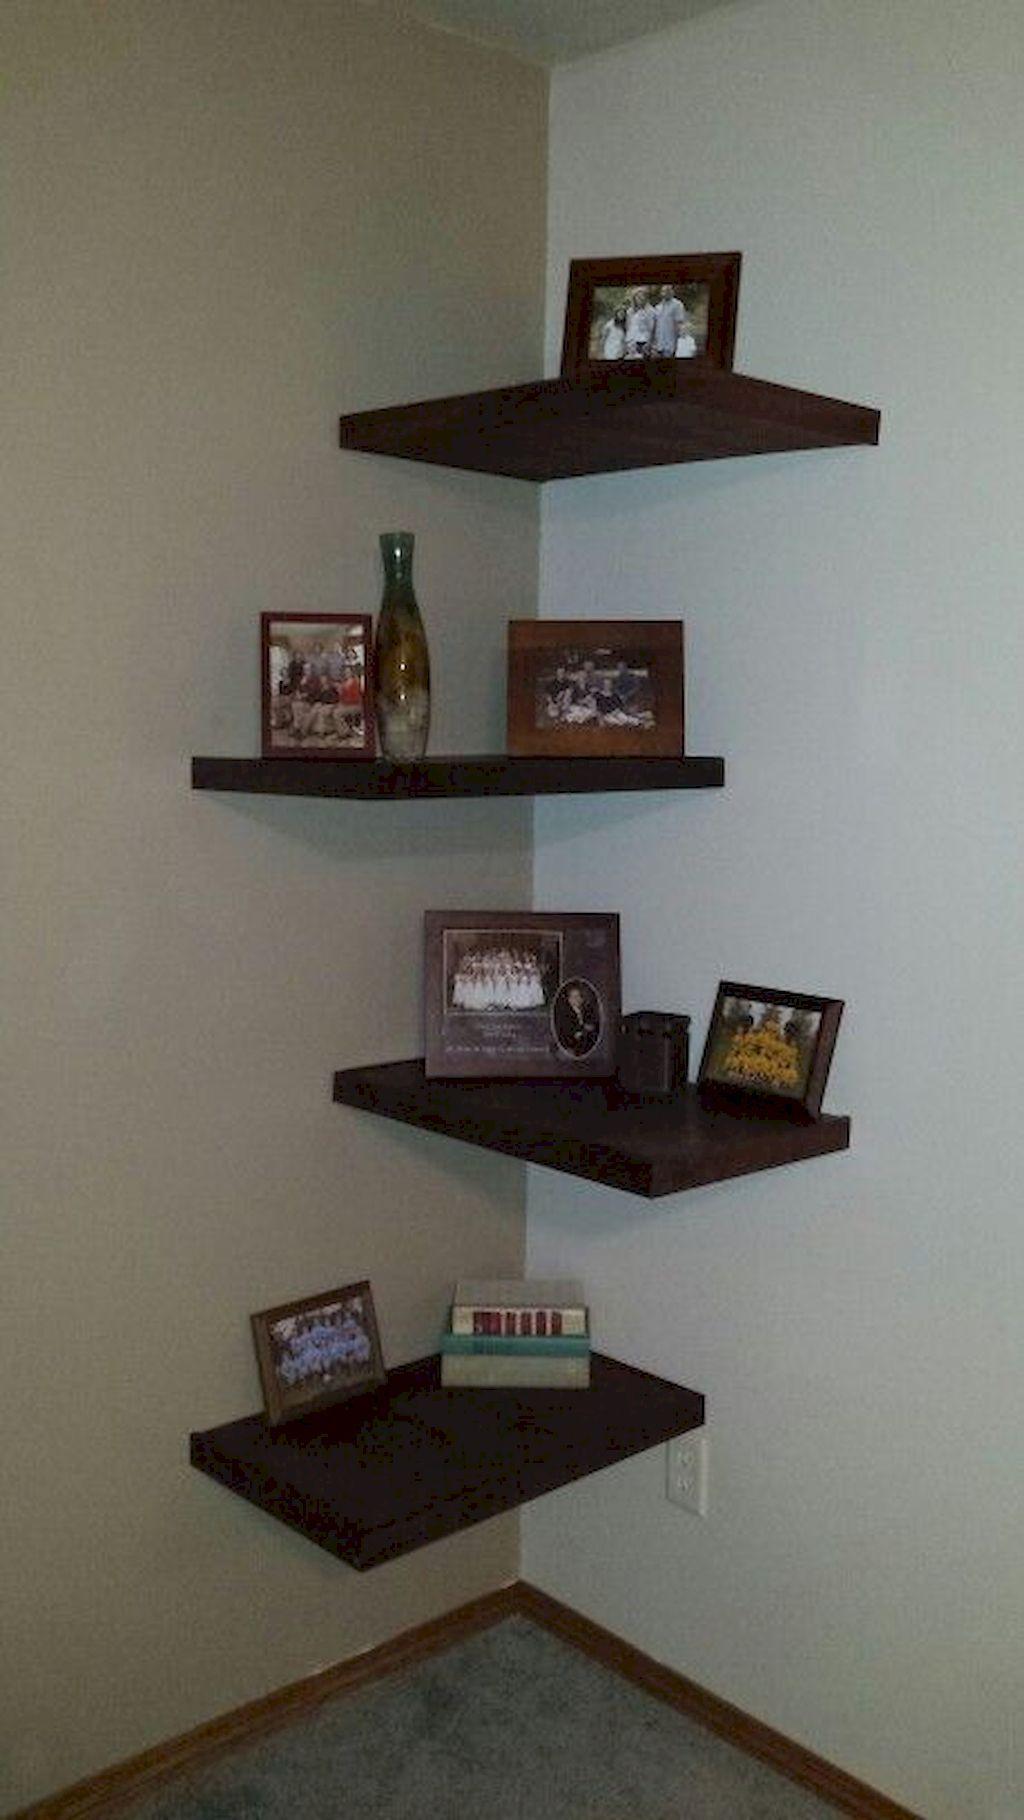 65 Diy Floating Corner Shelve For Living Room Decor Ideas Decoración De Esquina Muebles De Esquina Decoración De Repisas